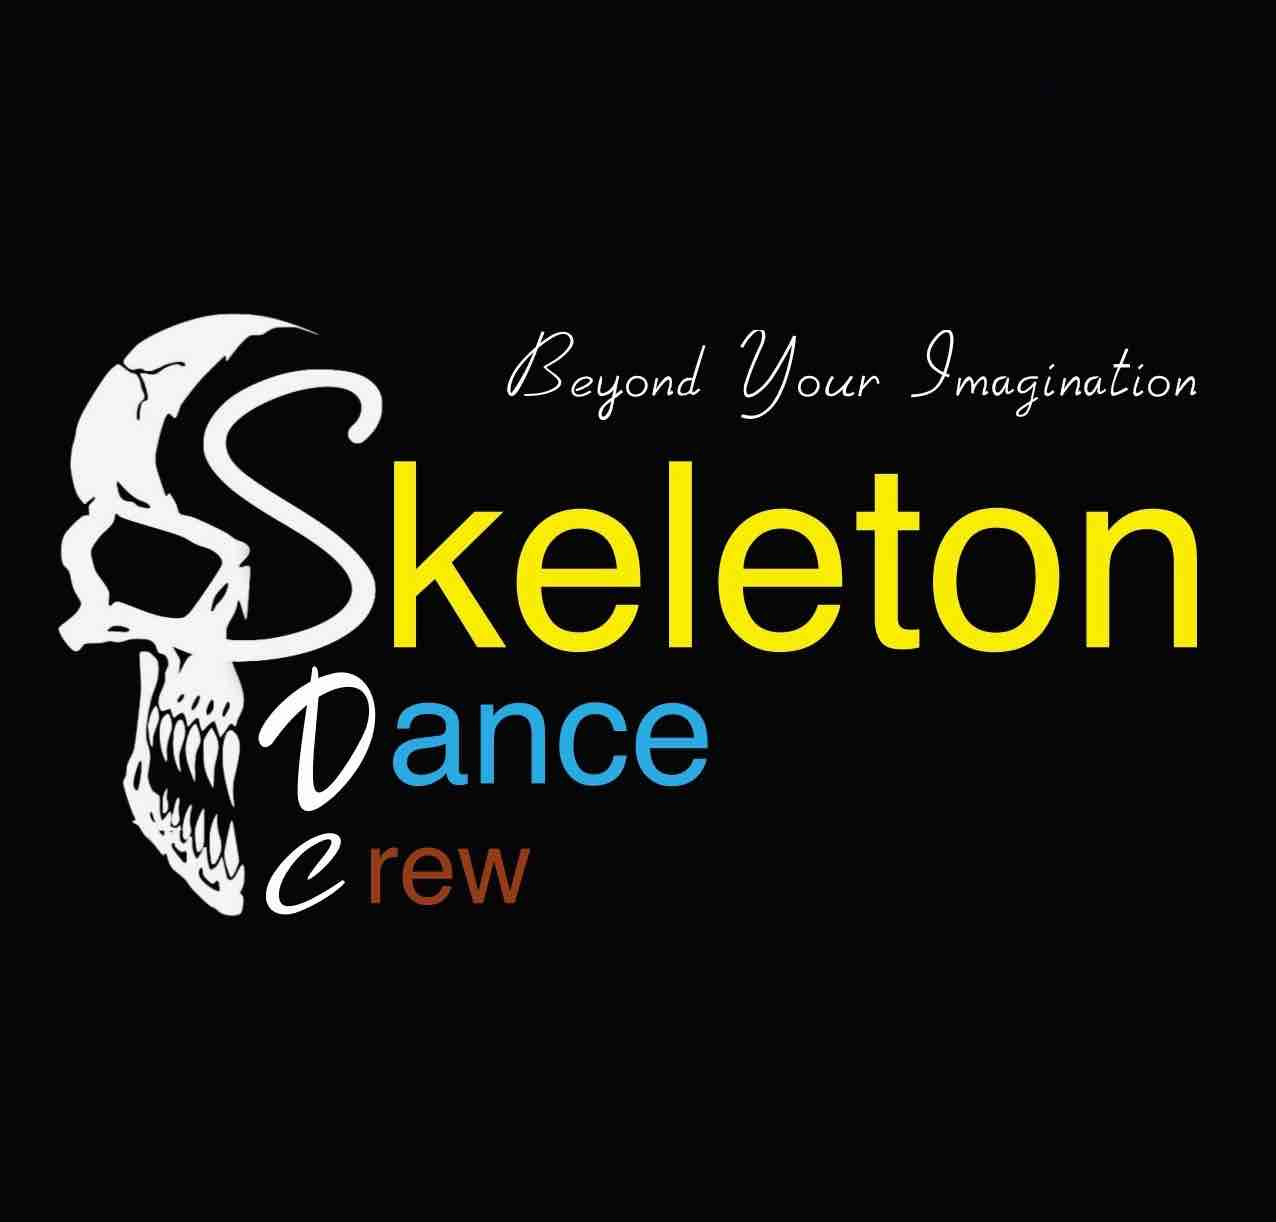 Tron Dance India +919810757109